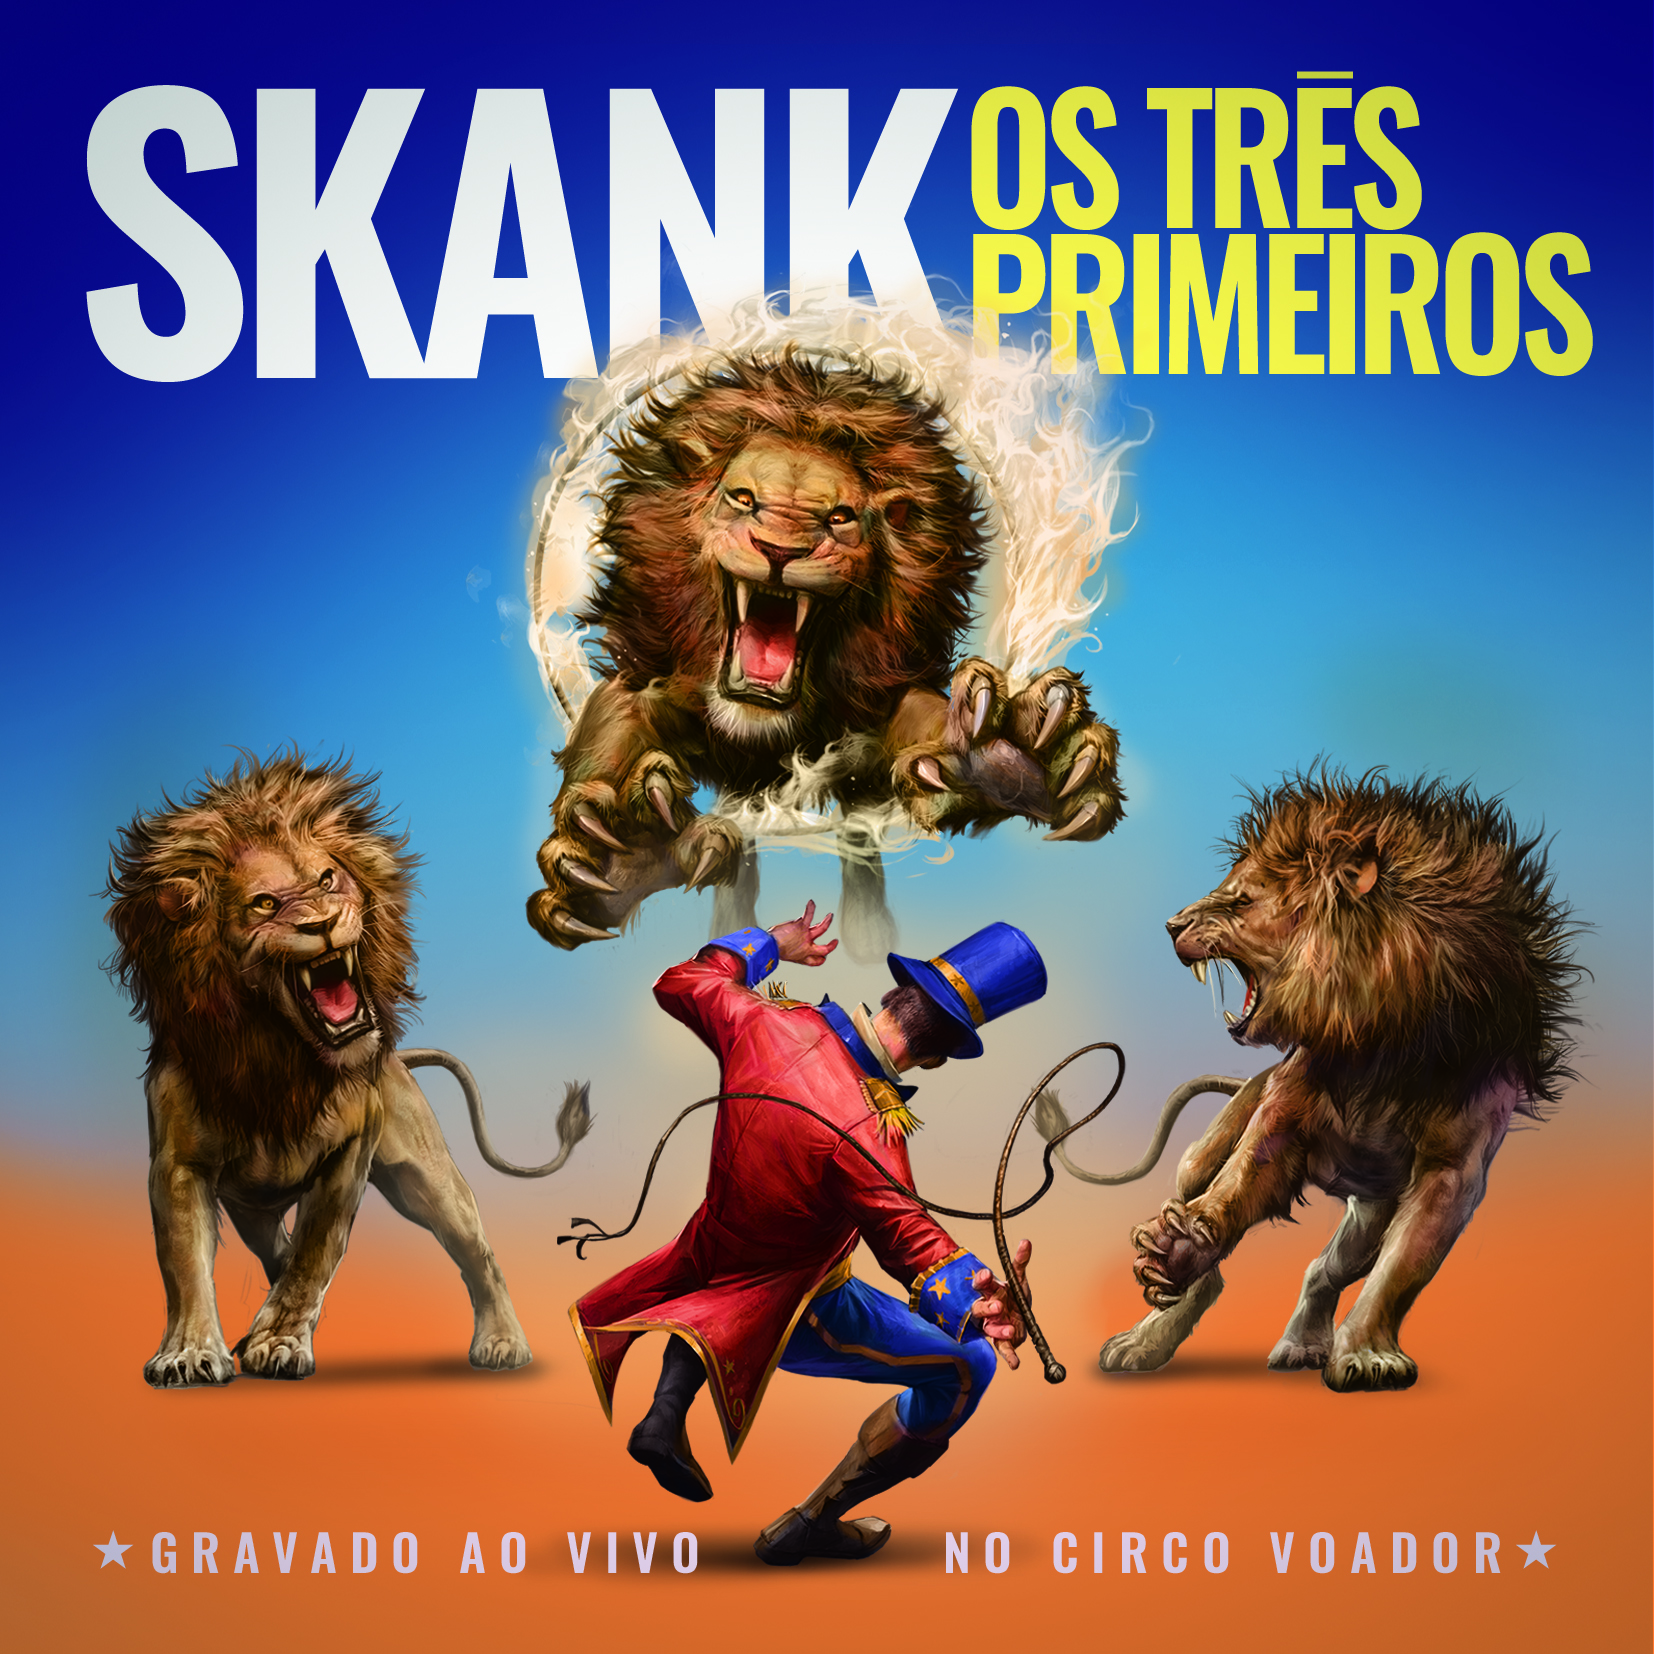 Skank. Foto: Divulgação